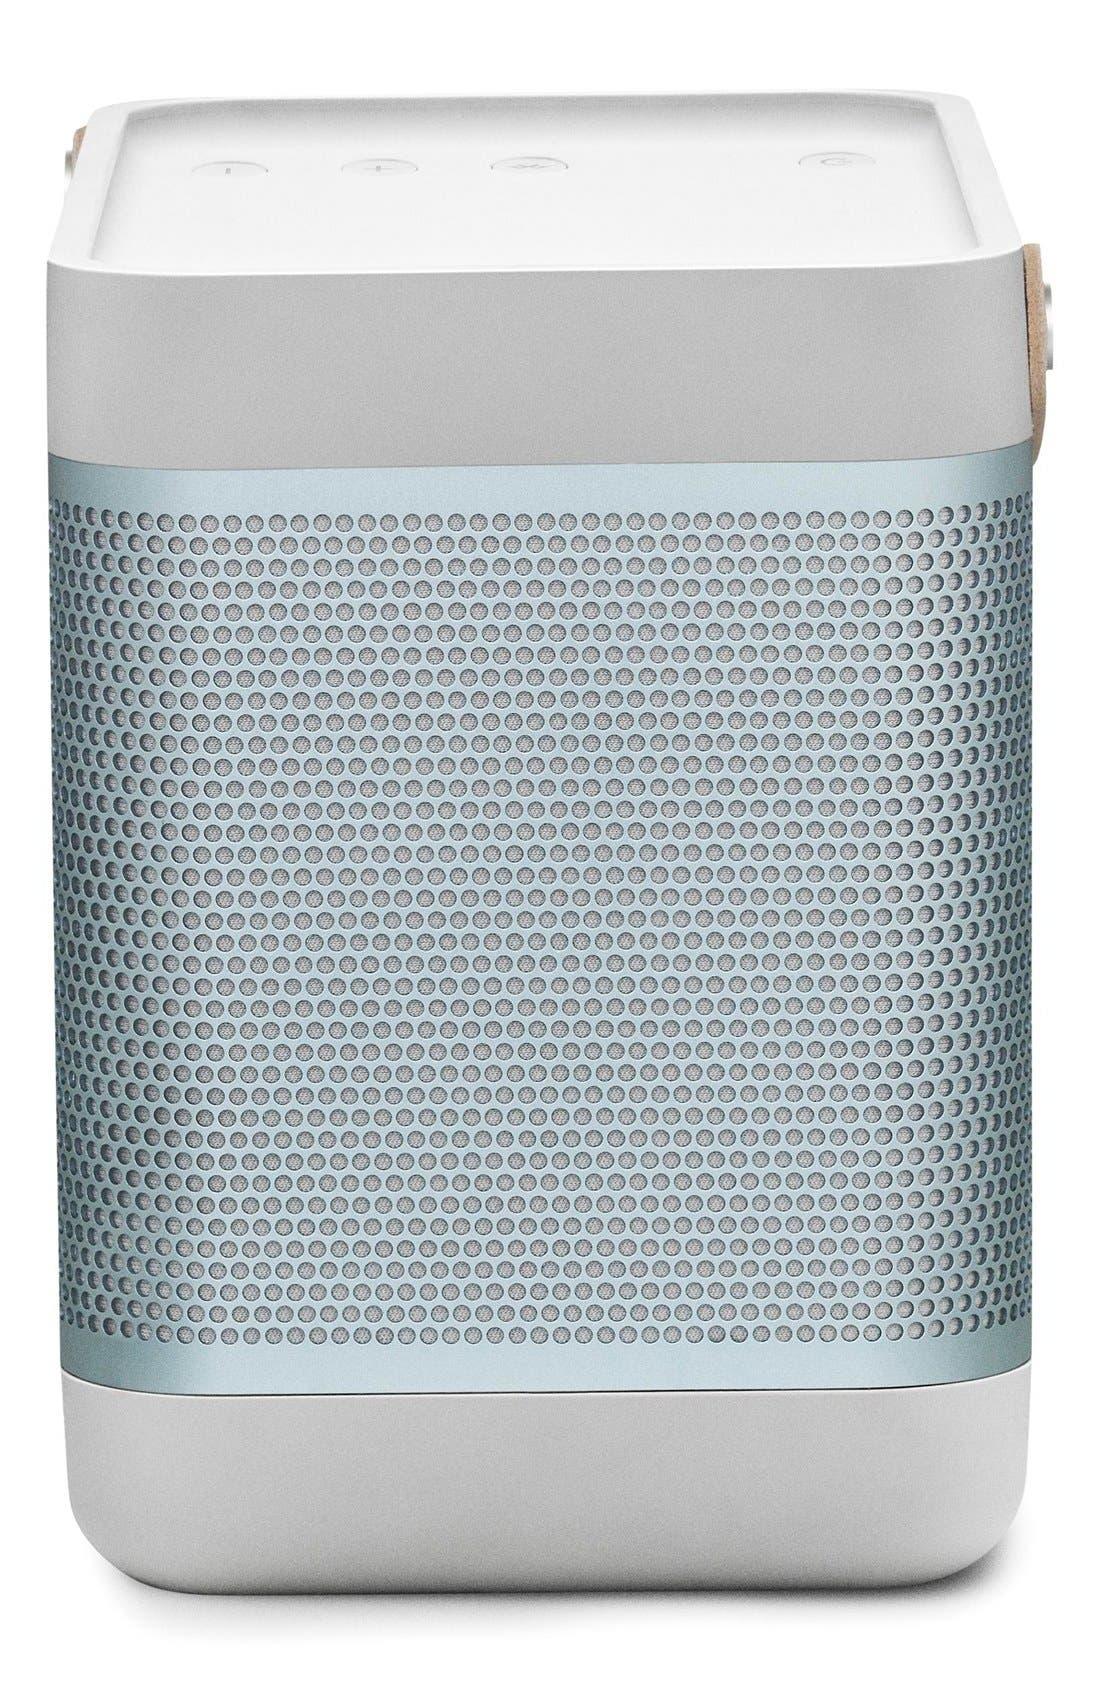 'Beolit 15' Portable Bluetooth<sup>®</sup> Speaker,                             Alternate thumbnail 3, color,                             POLAR BLUE